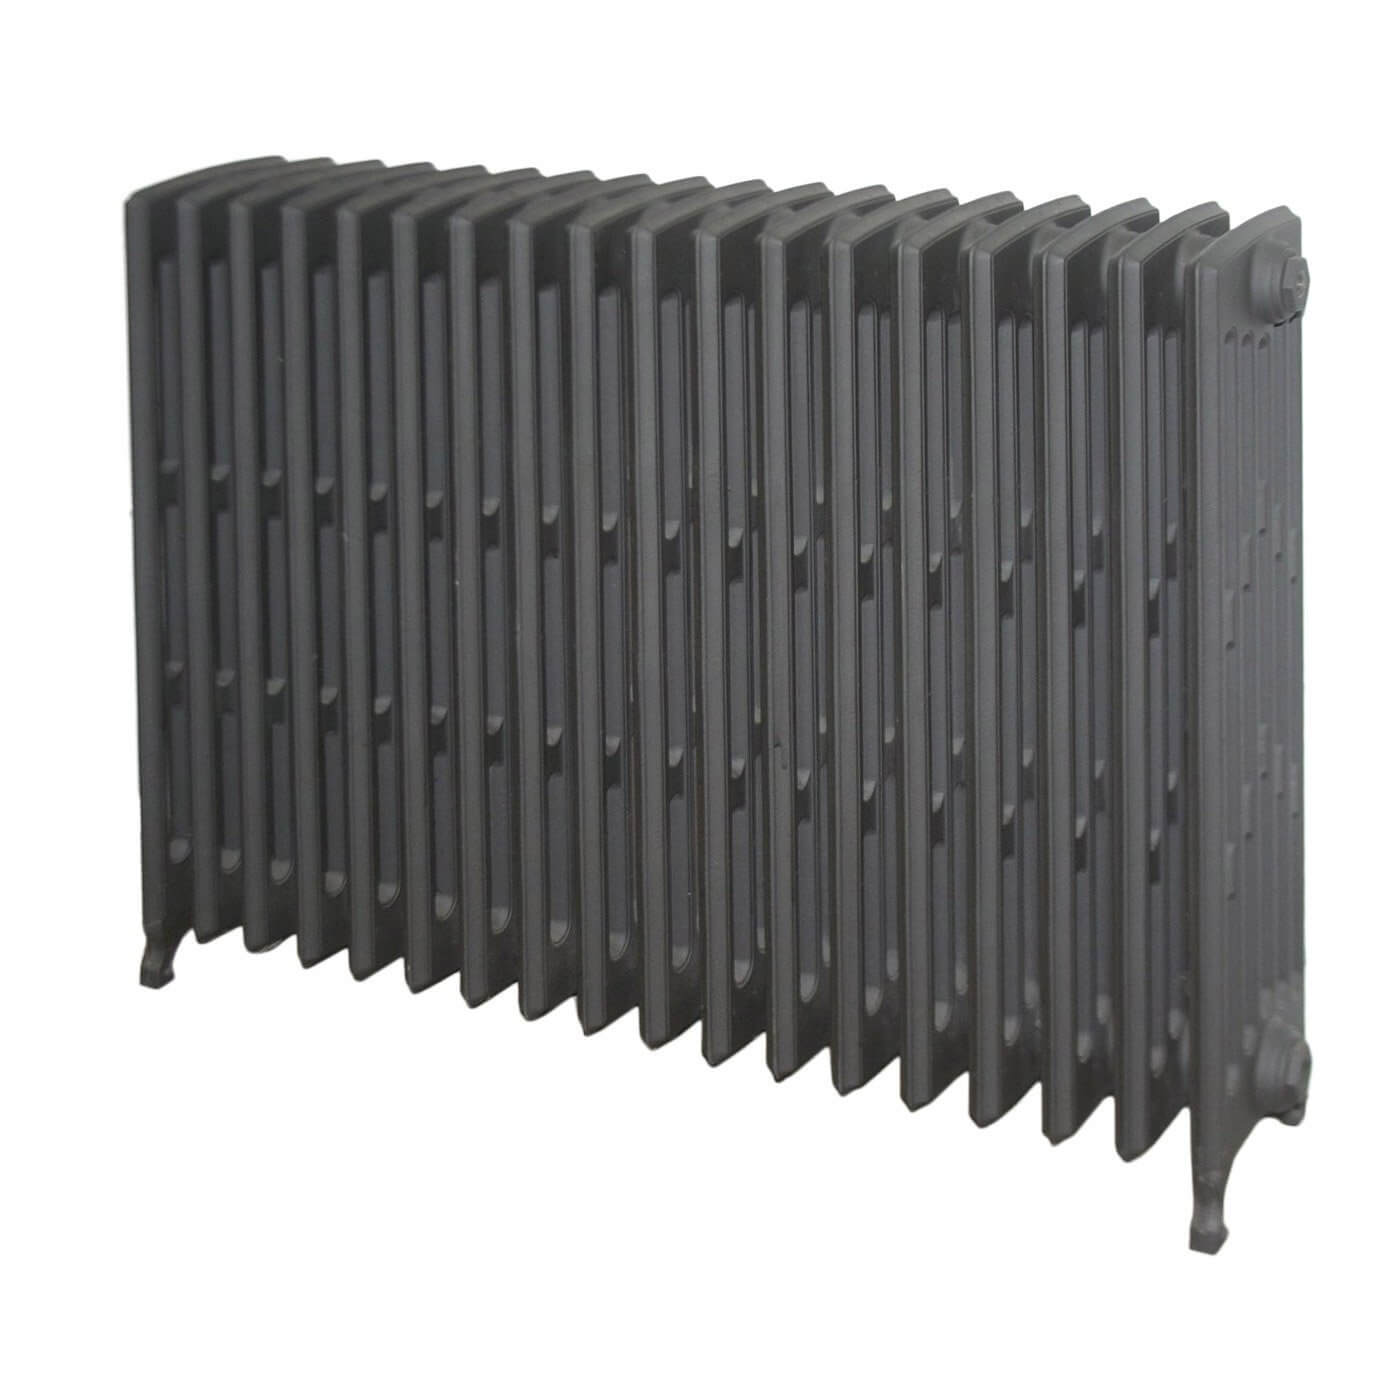 radiateur fonte ideal standard amazing id es propos de radiateur fonte sur pinterest radiateur. Black Bedroom Furniture Sets. Home Design Ideas